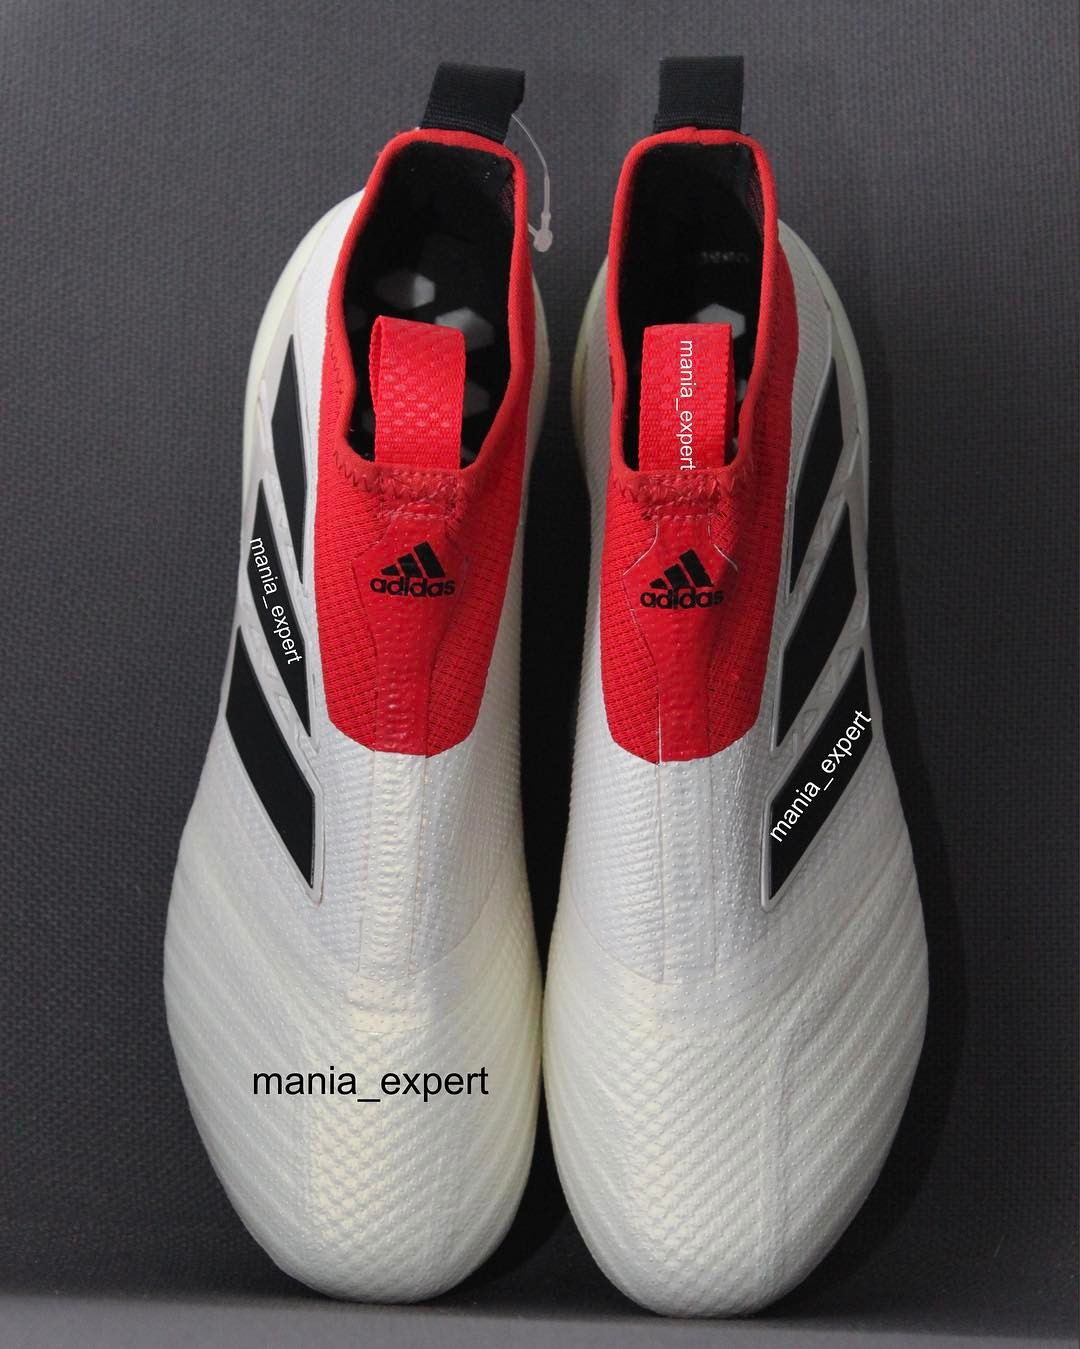 Adidas Ace 17 Purecontrol Schwarz